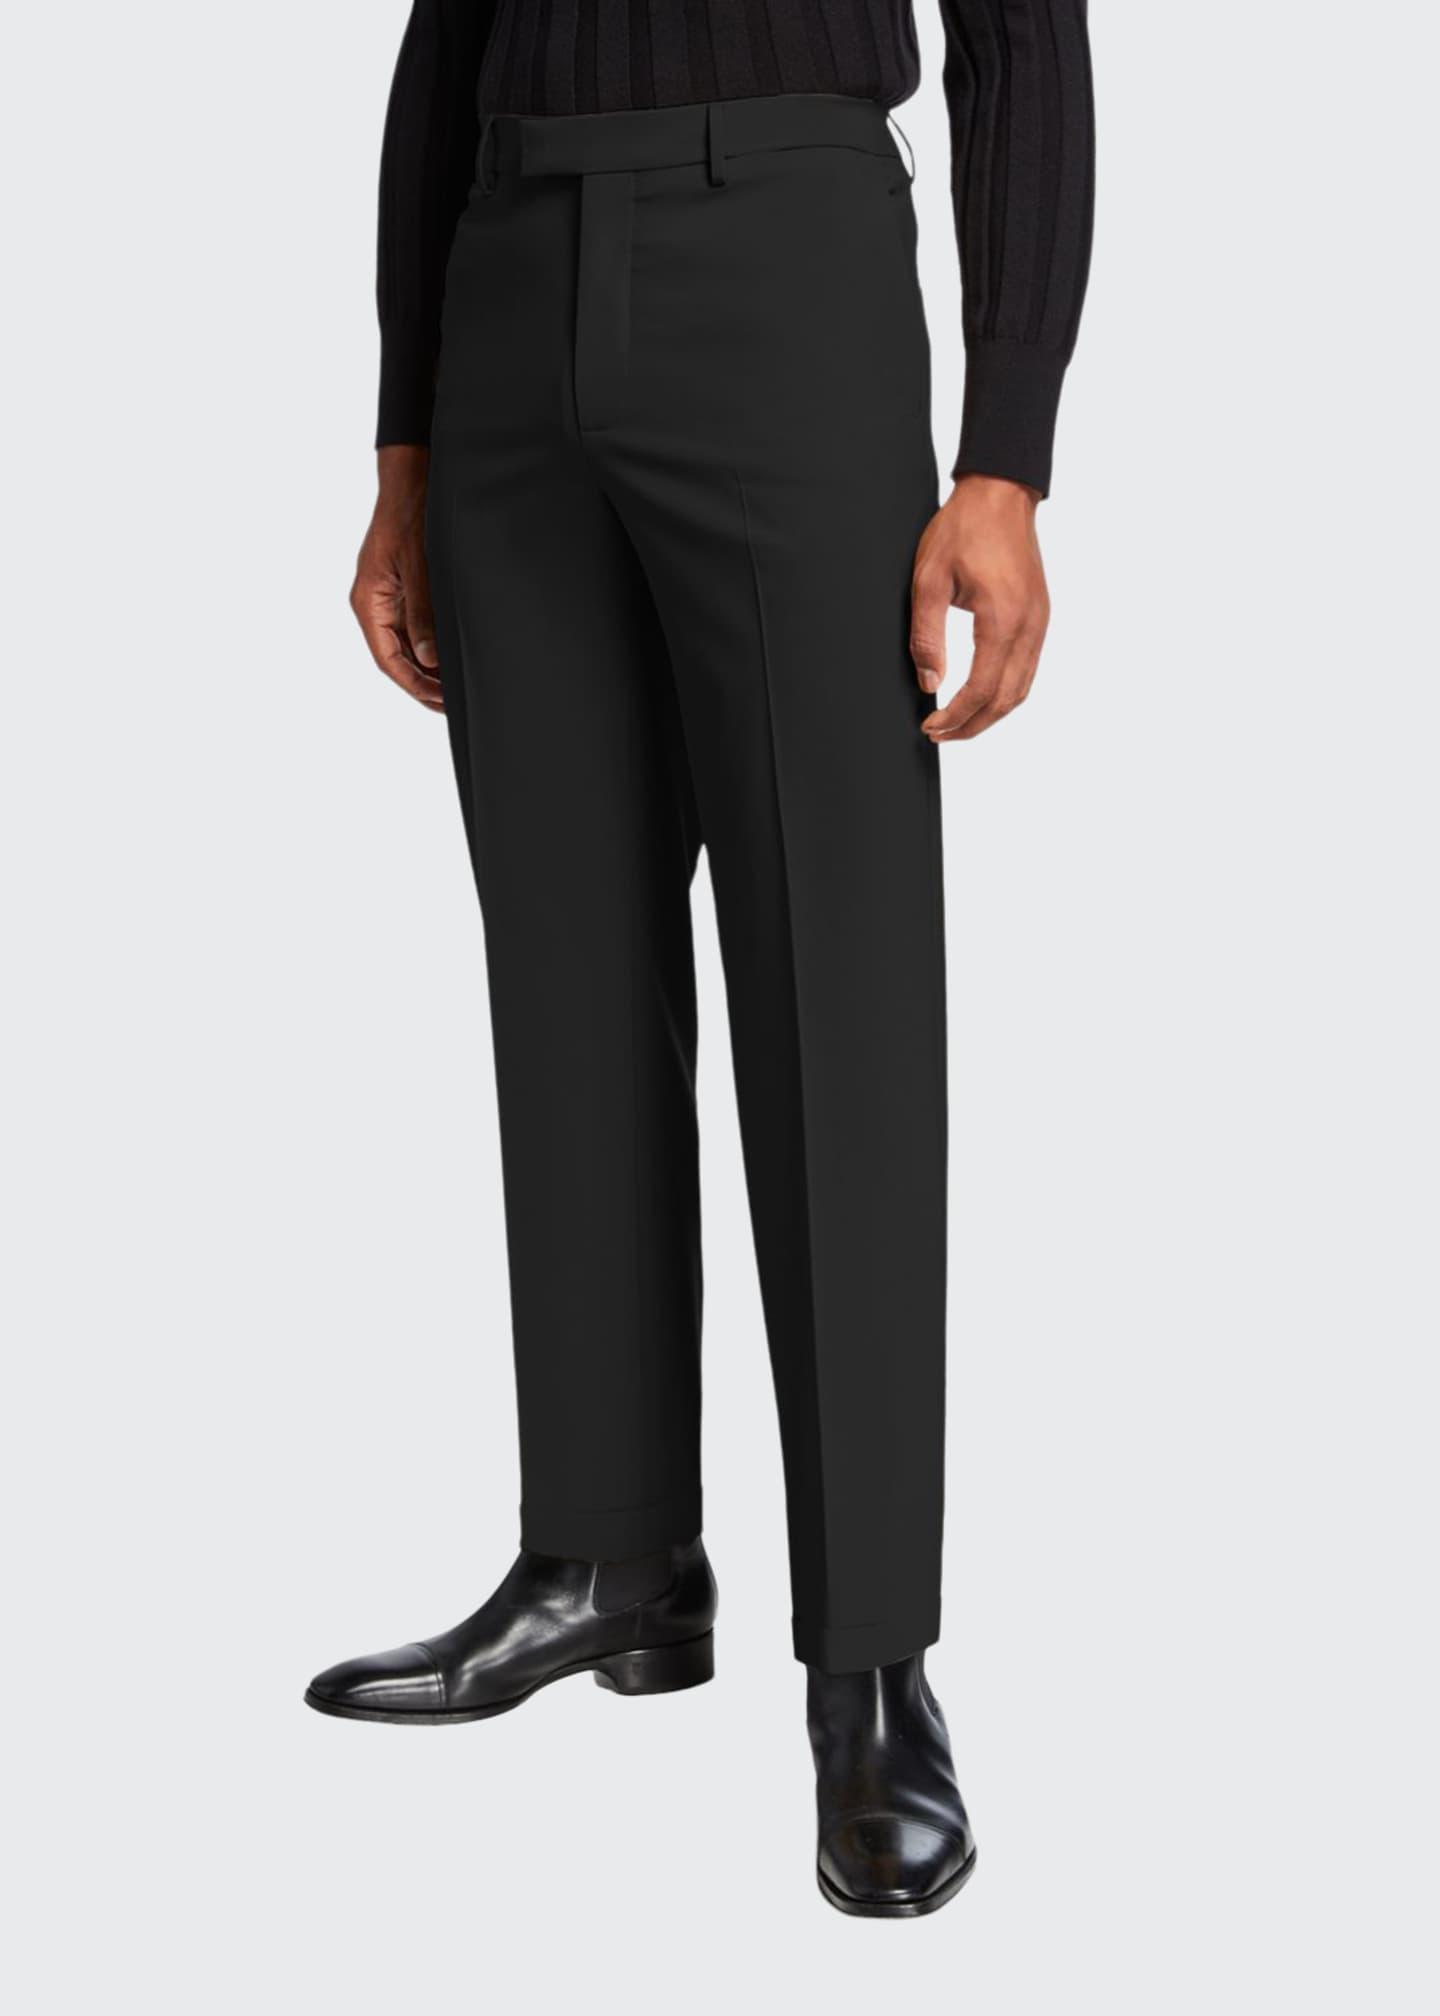 Bottega Veneta Men's Mohair-Blend Slim-Fit Dress Pants